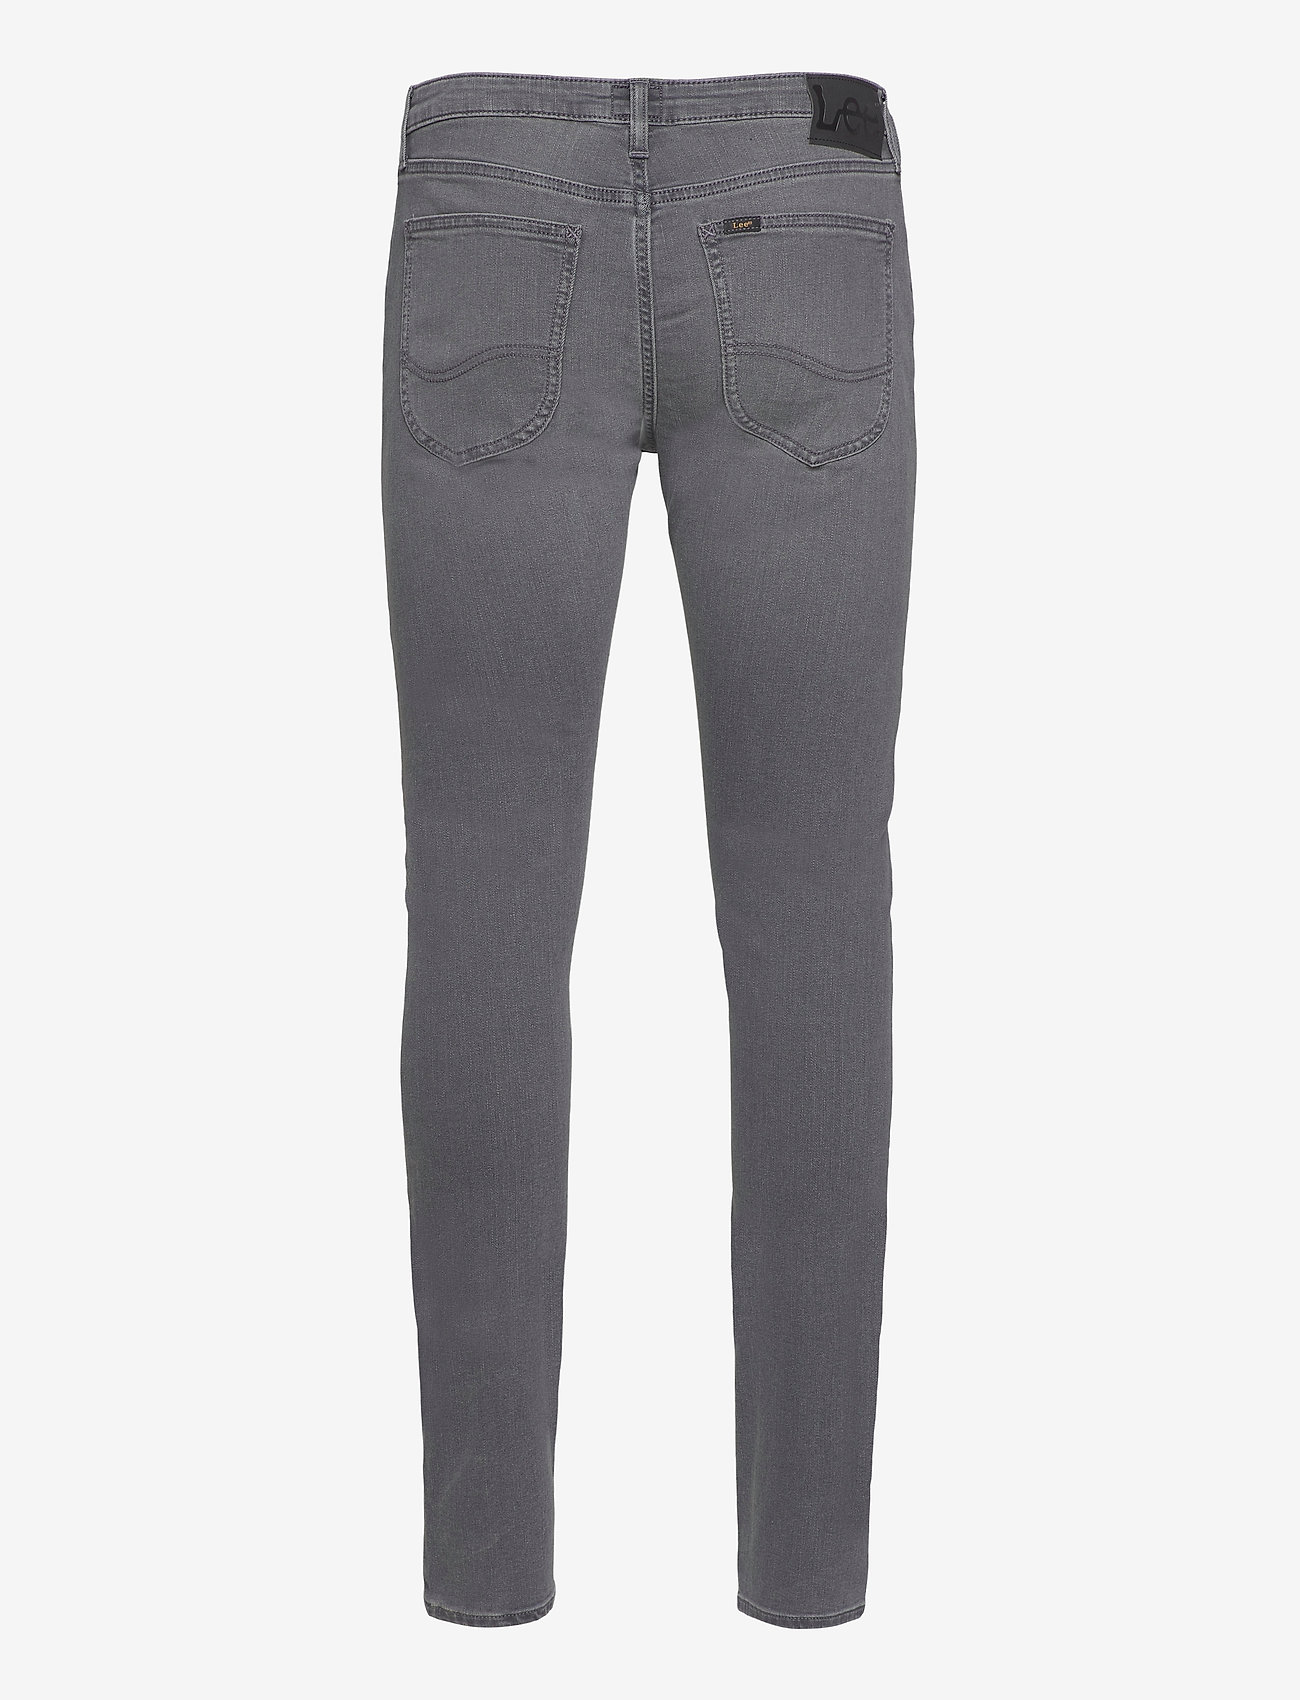 Lee Jeans - MALONE - skinny jeans - mid eden - 1